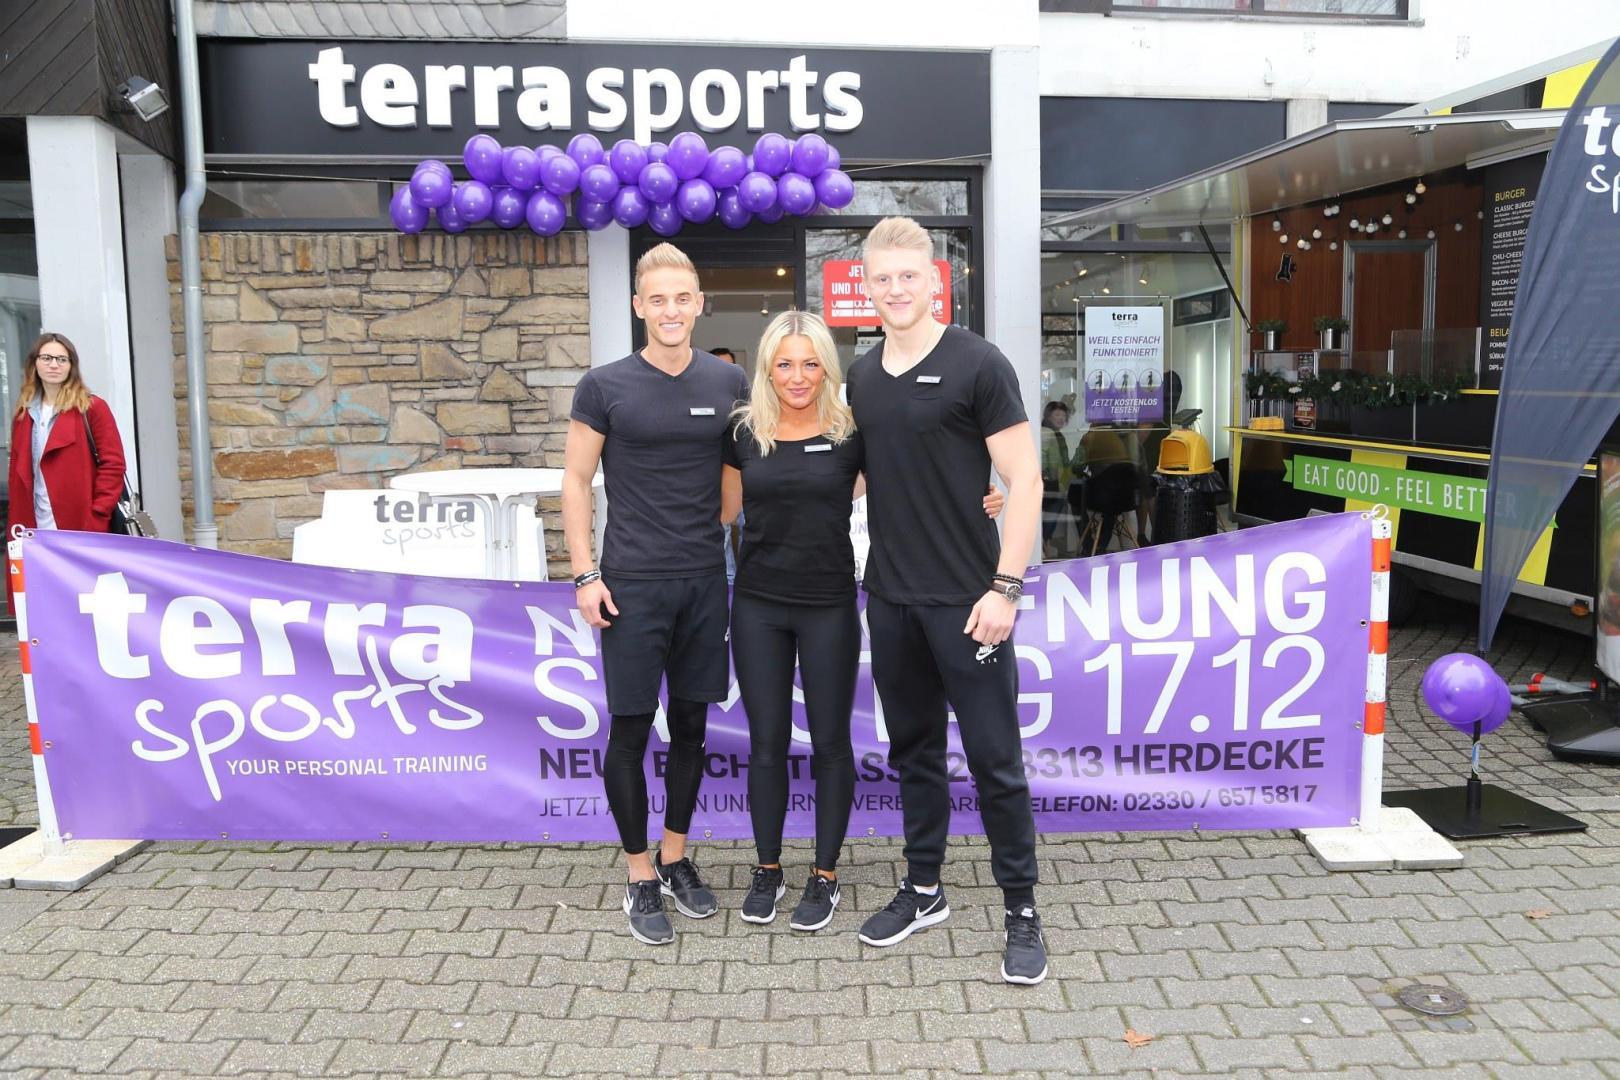 Terra Sports